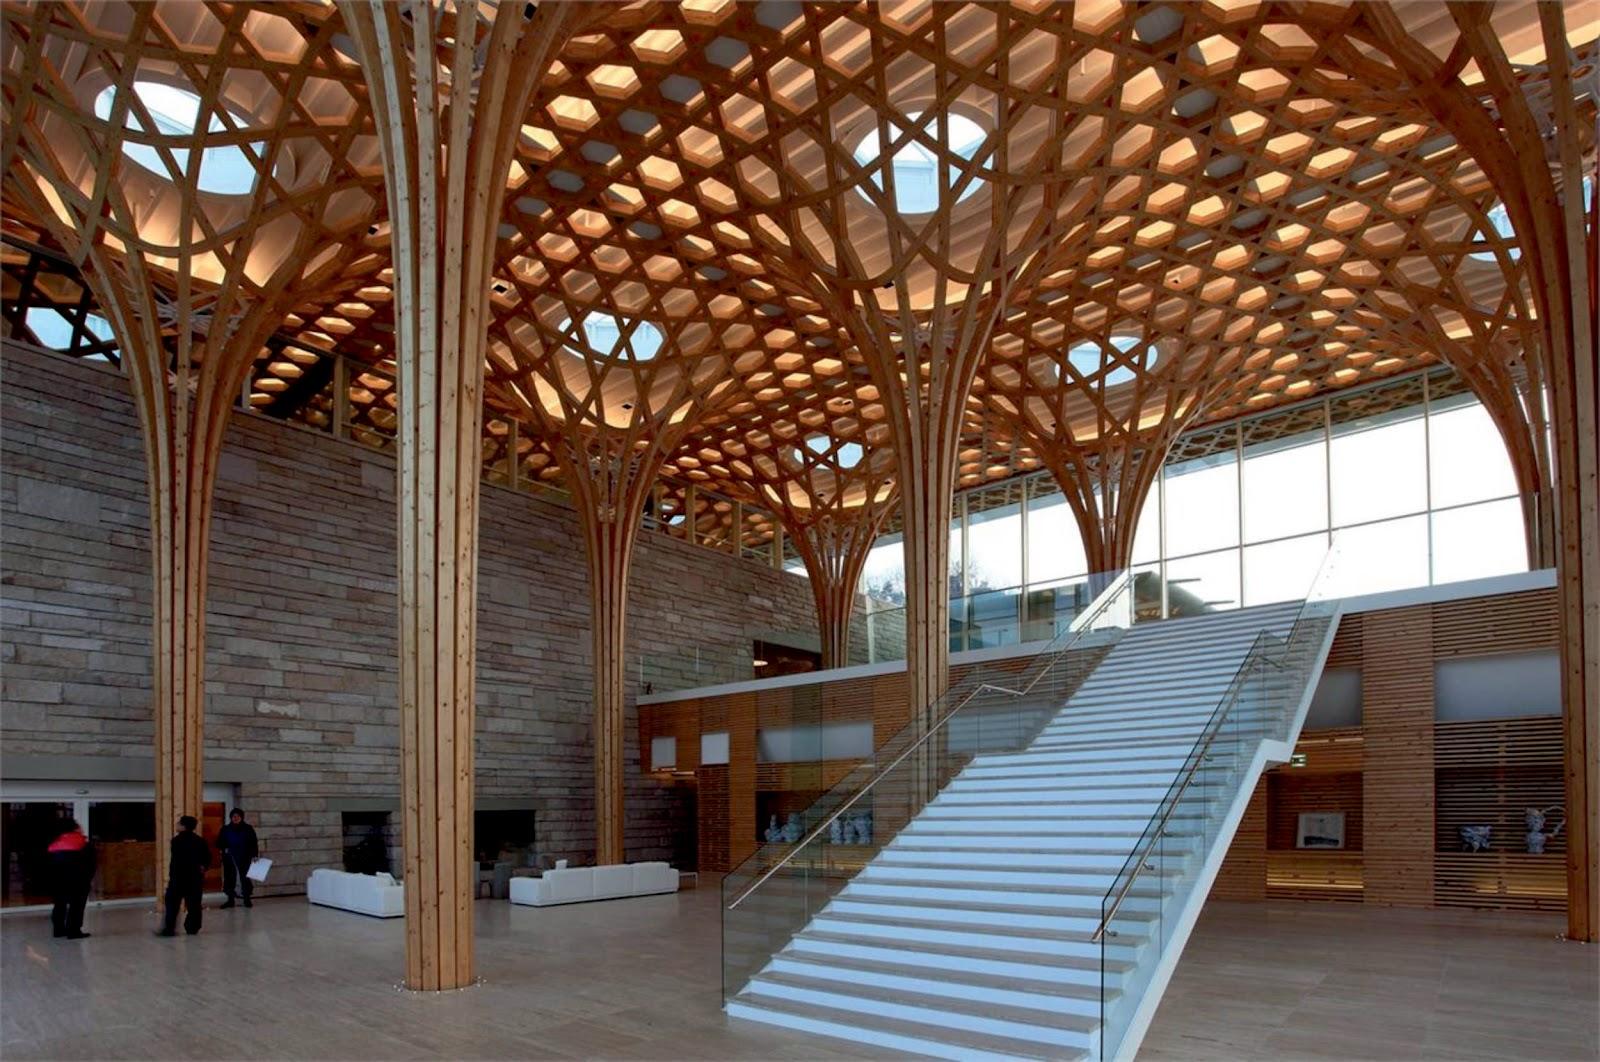 architecture haesley nine bridges golf clubhouse by shigeru ban. Black Bedroom Furniture Sets. Home Design Ideas